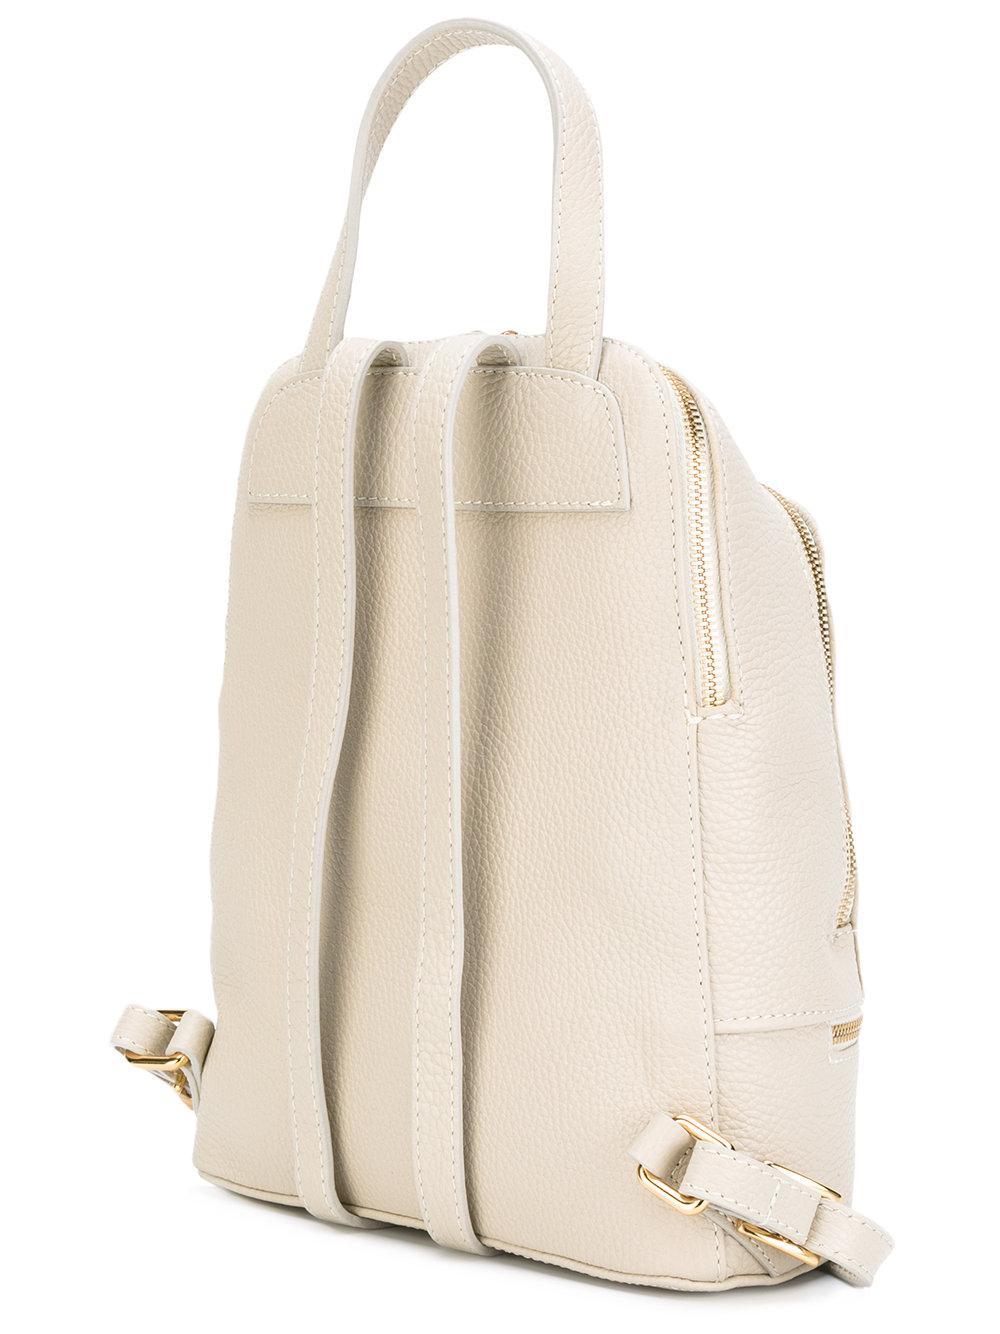 Baldinini Leather Zip-around Backpack in Natural